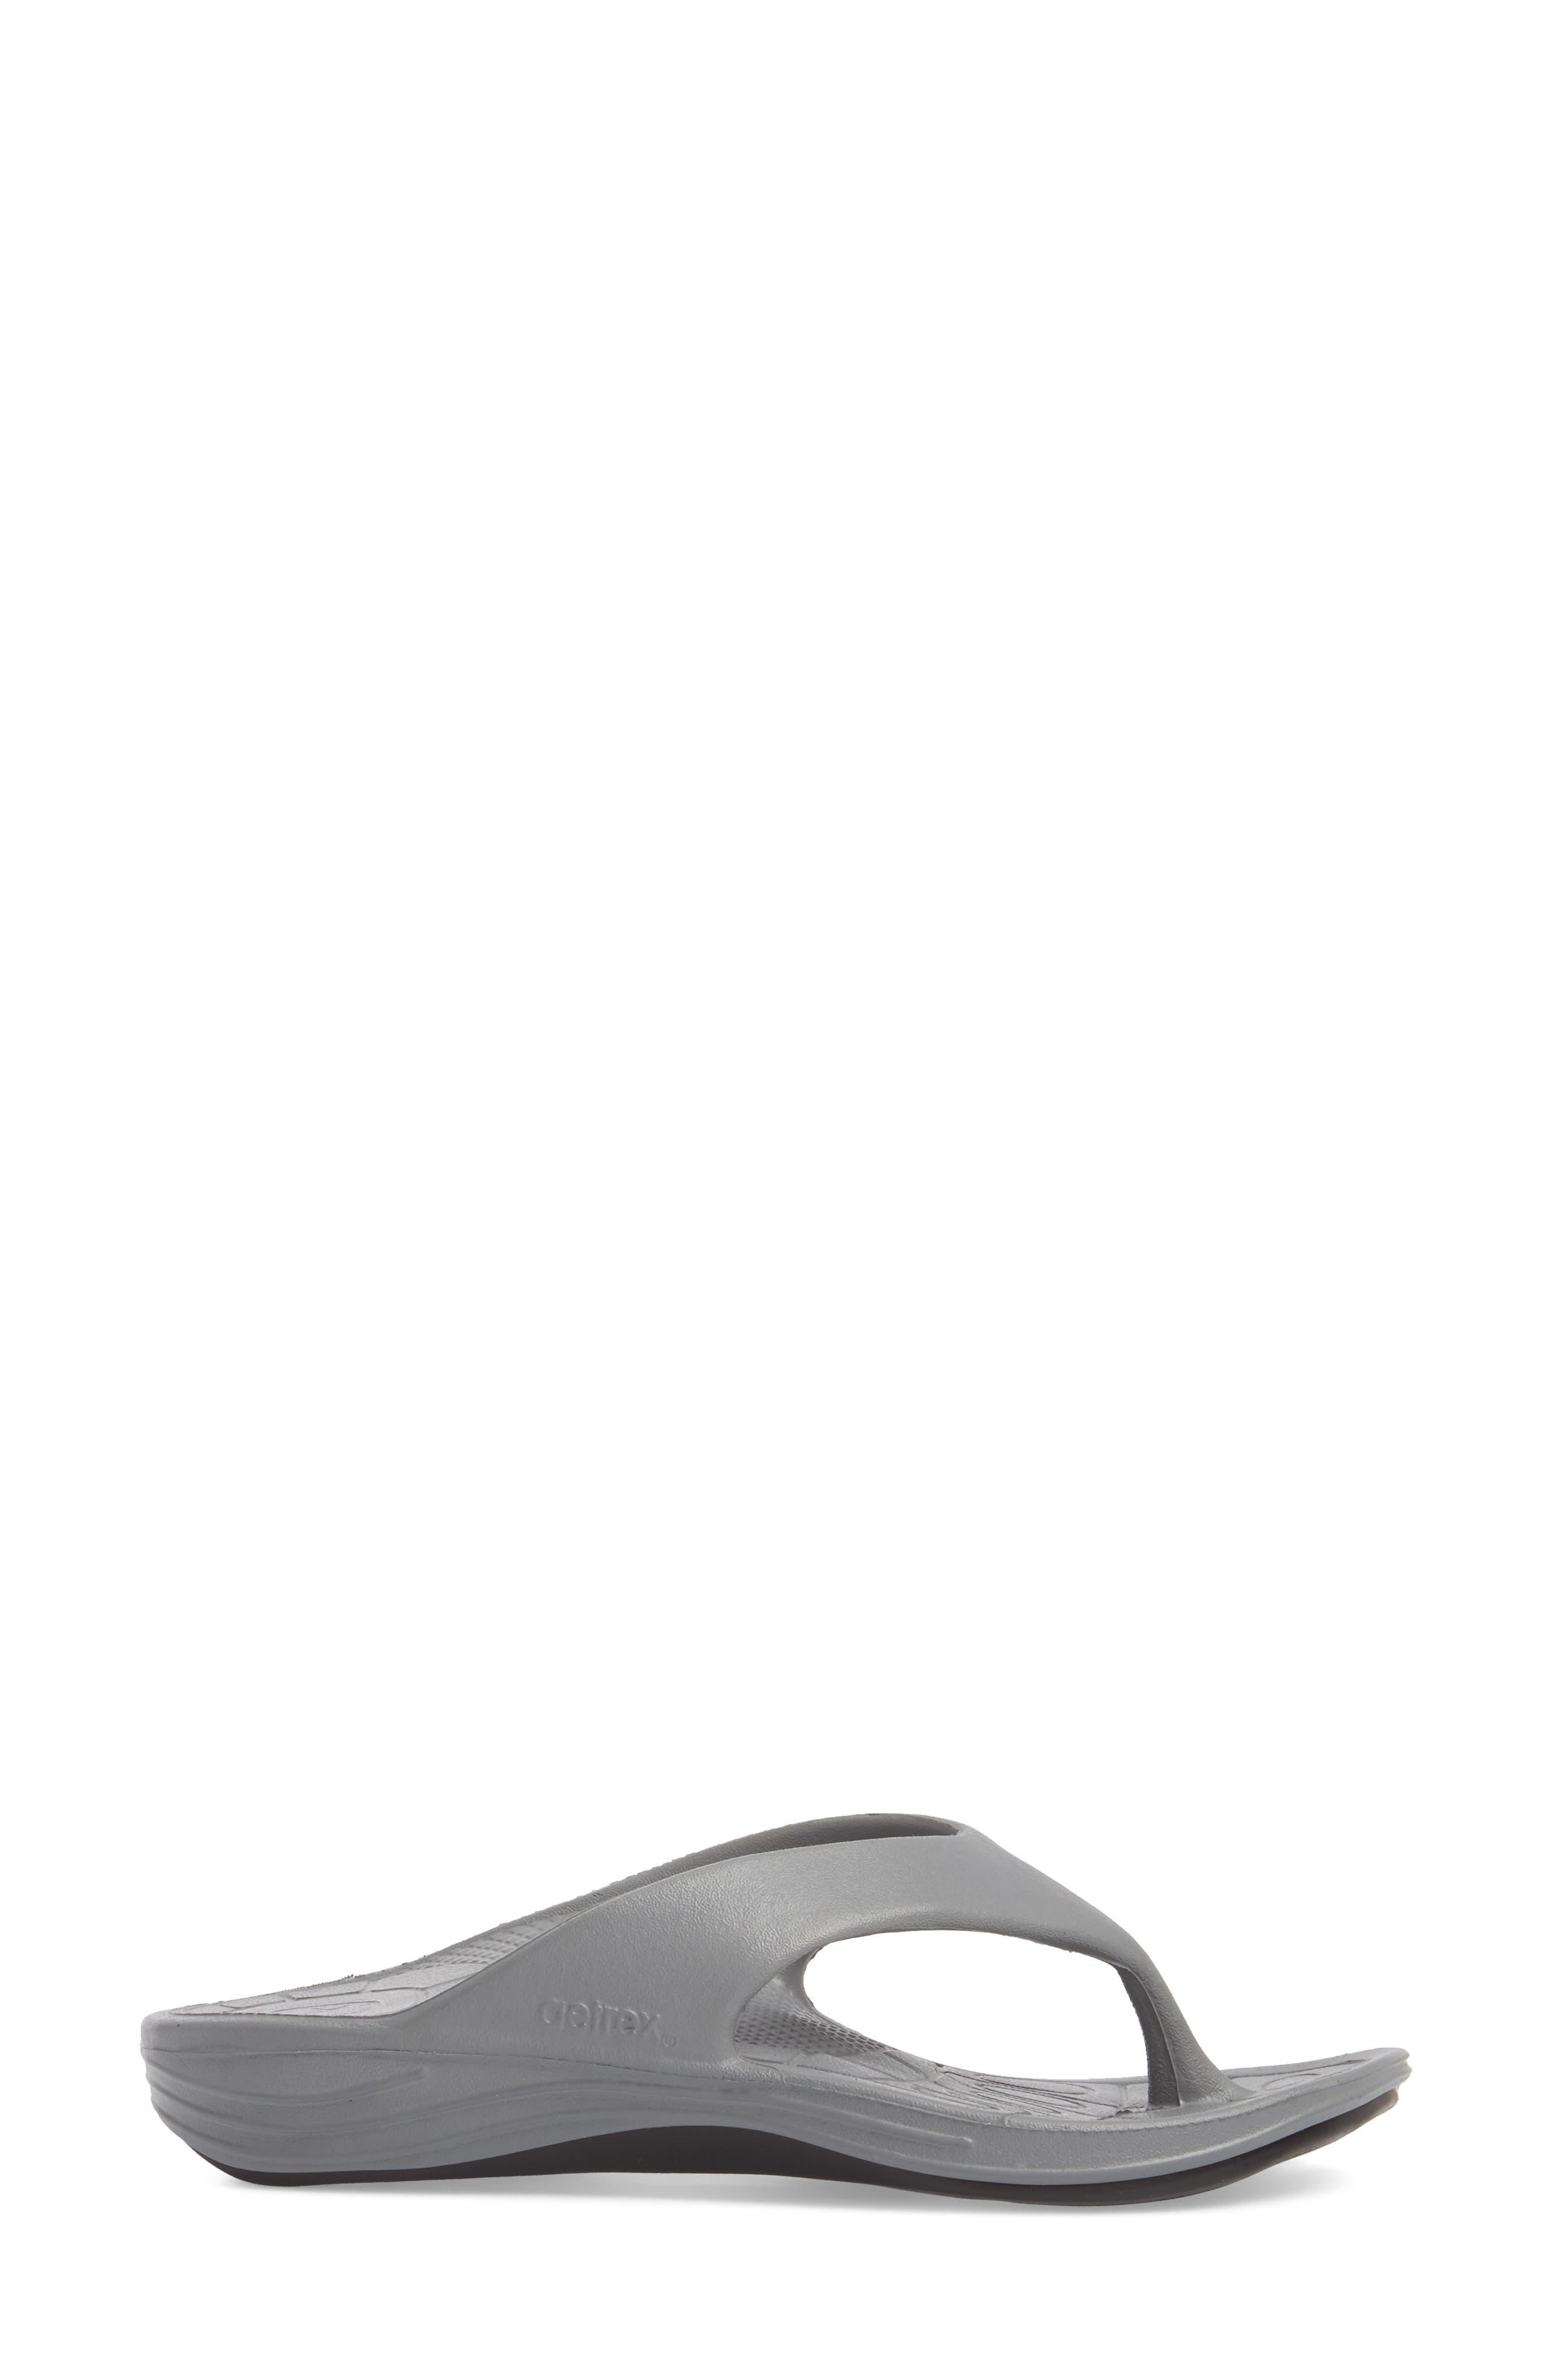 Lynco Flip Flop,                             Alternate thumbnail 3, color,                             GREY